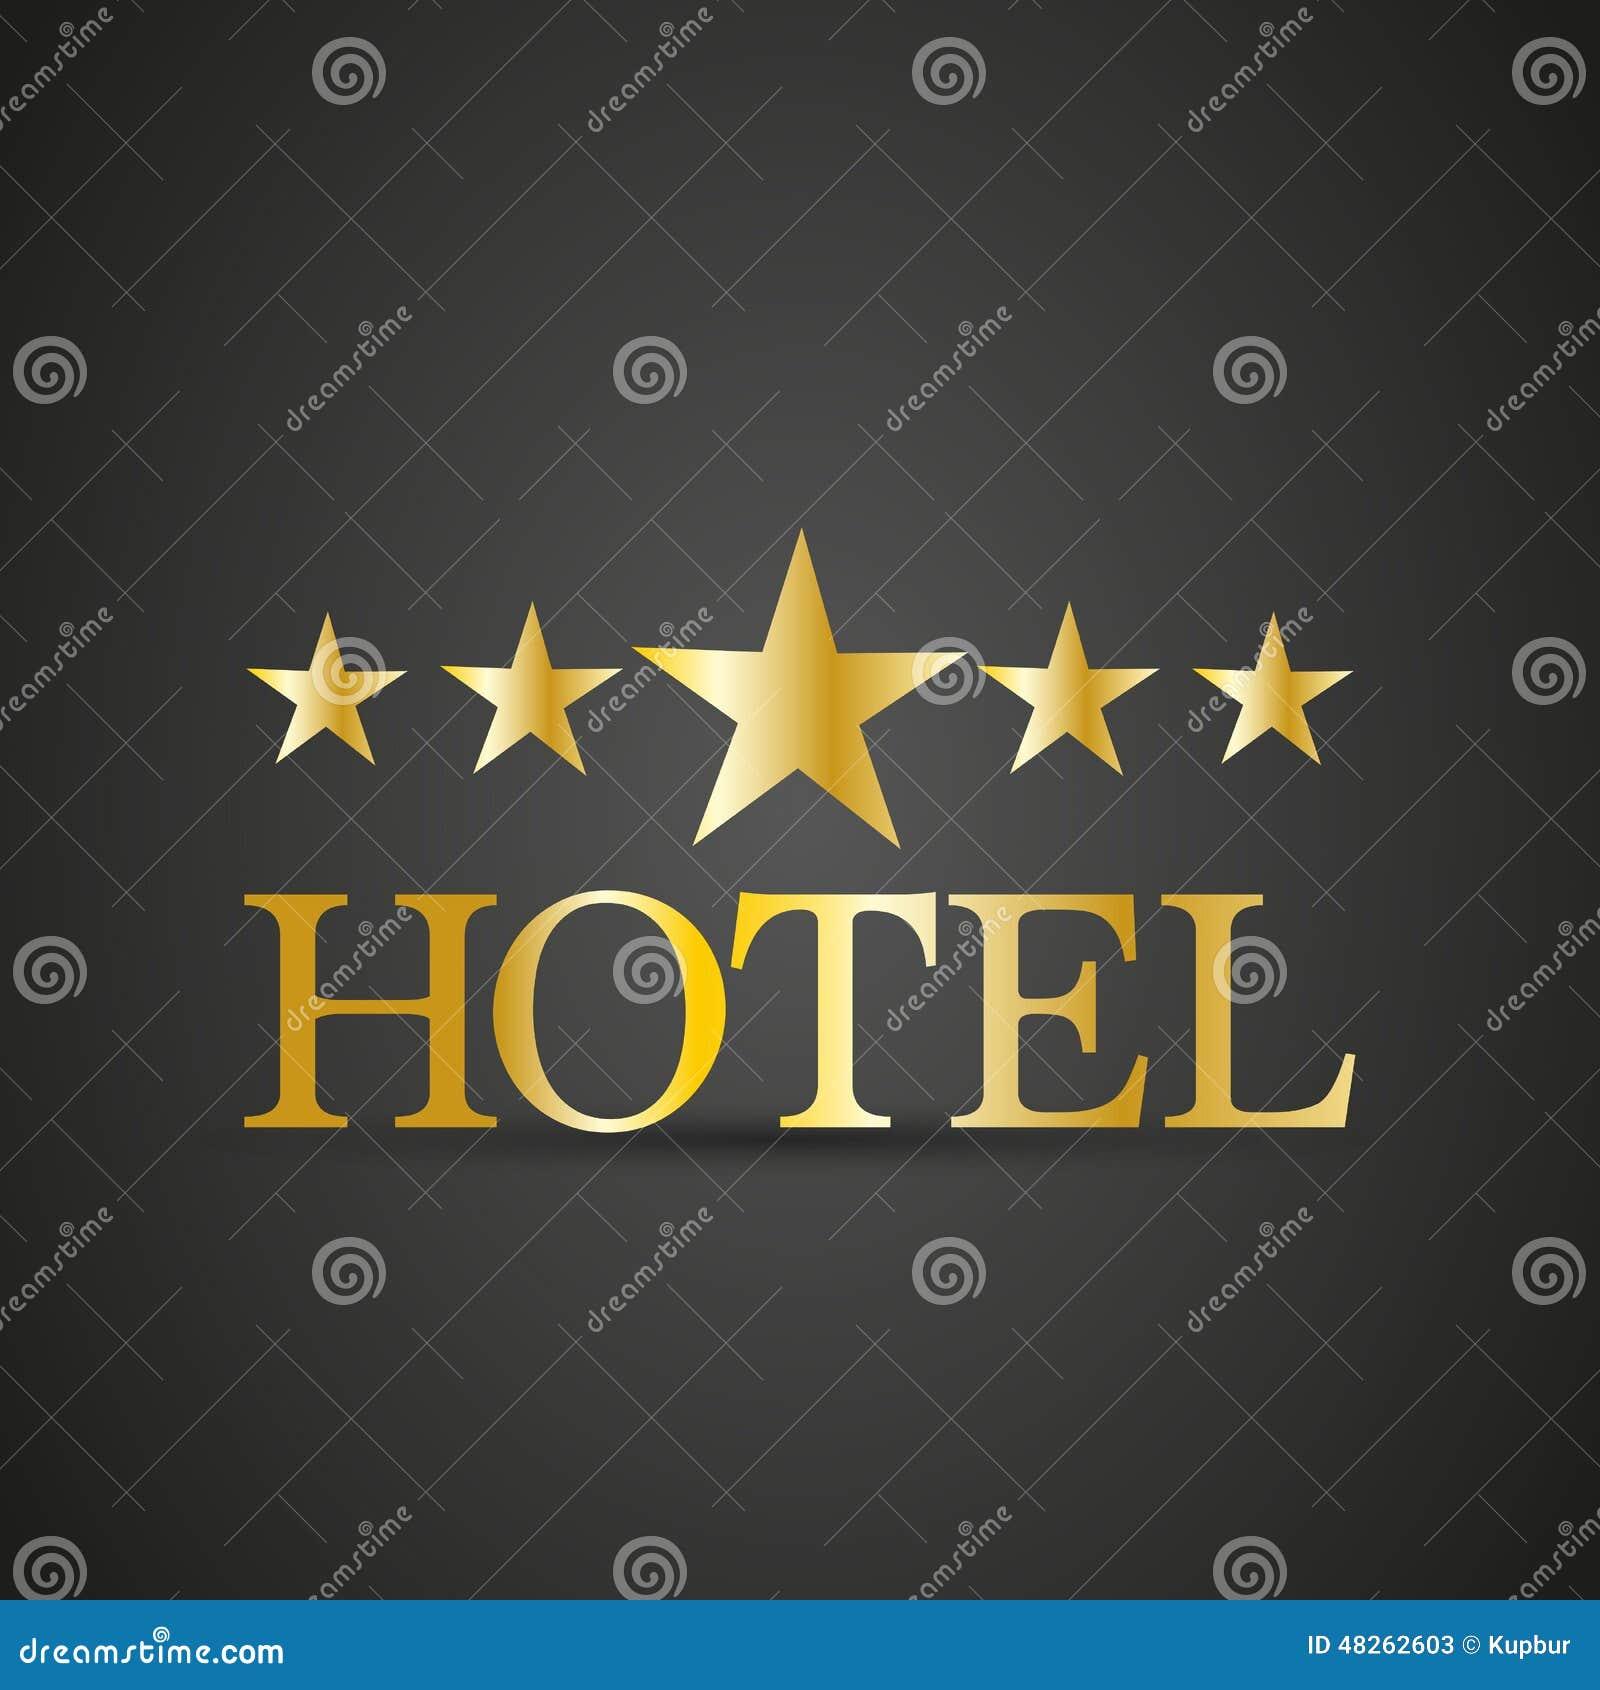 Golden Five Star Hotel Sign Cartoon Vector